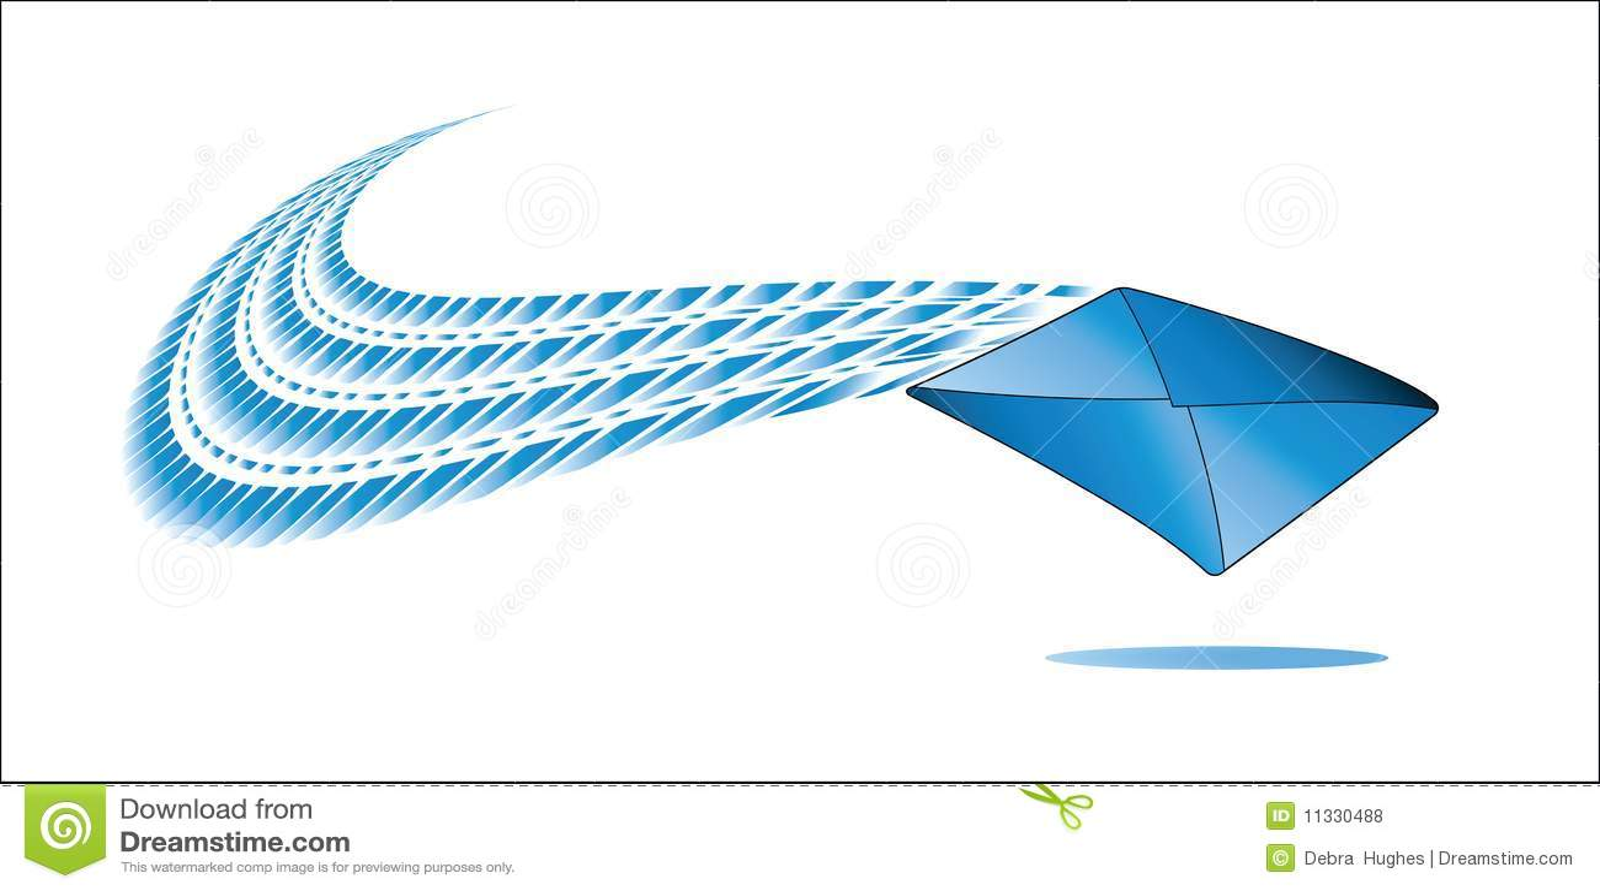 Envelope with swoosh